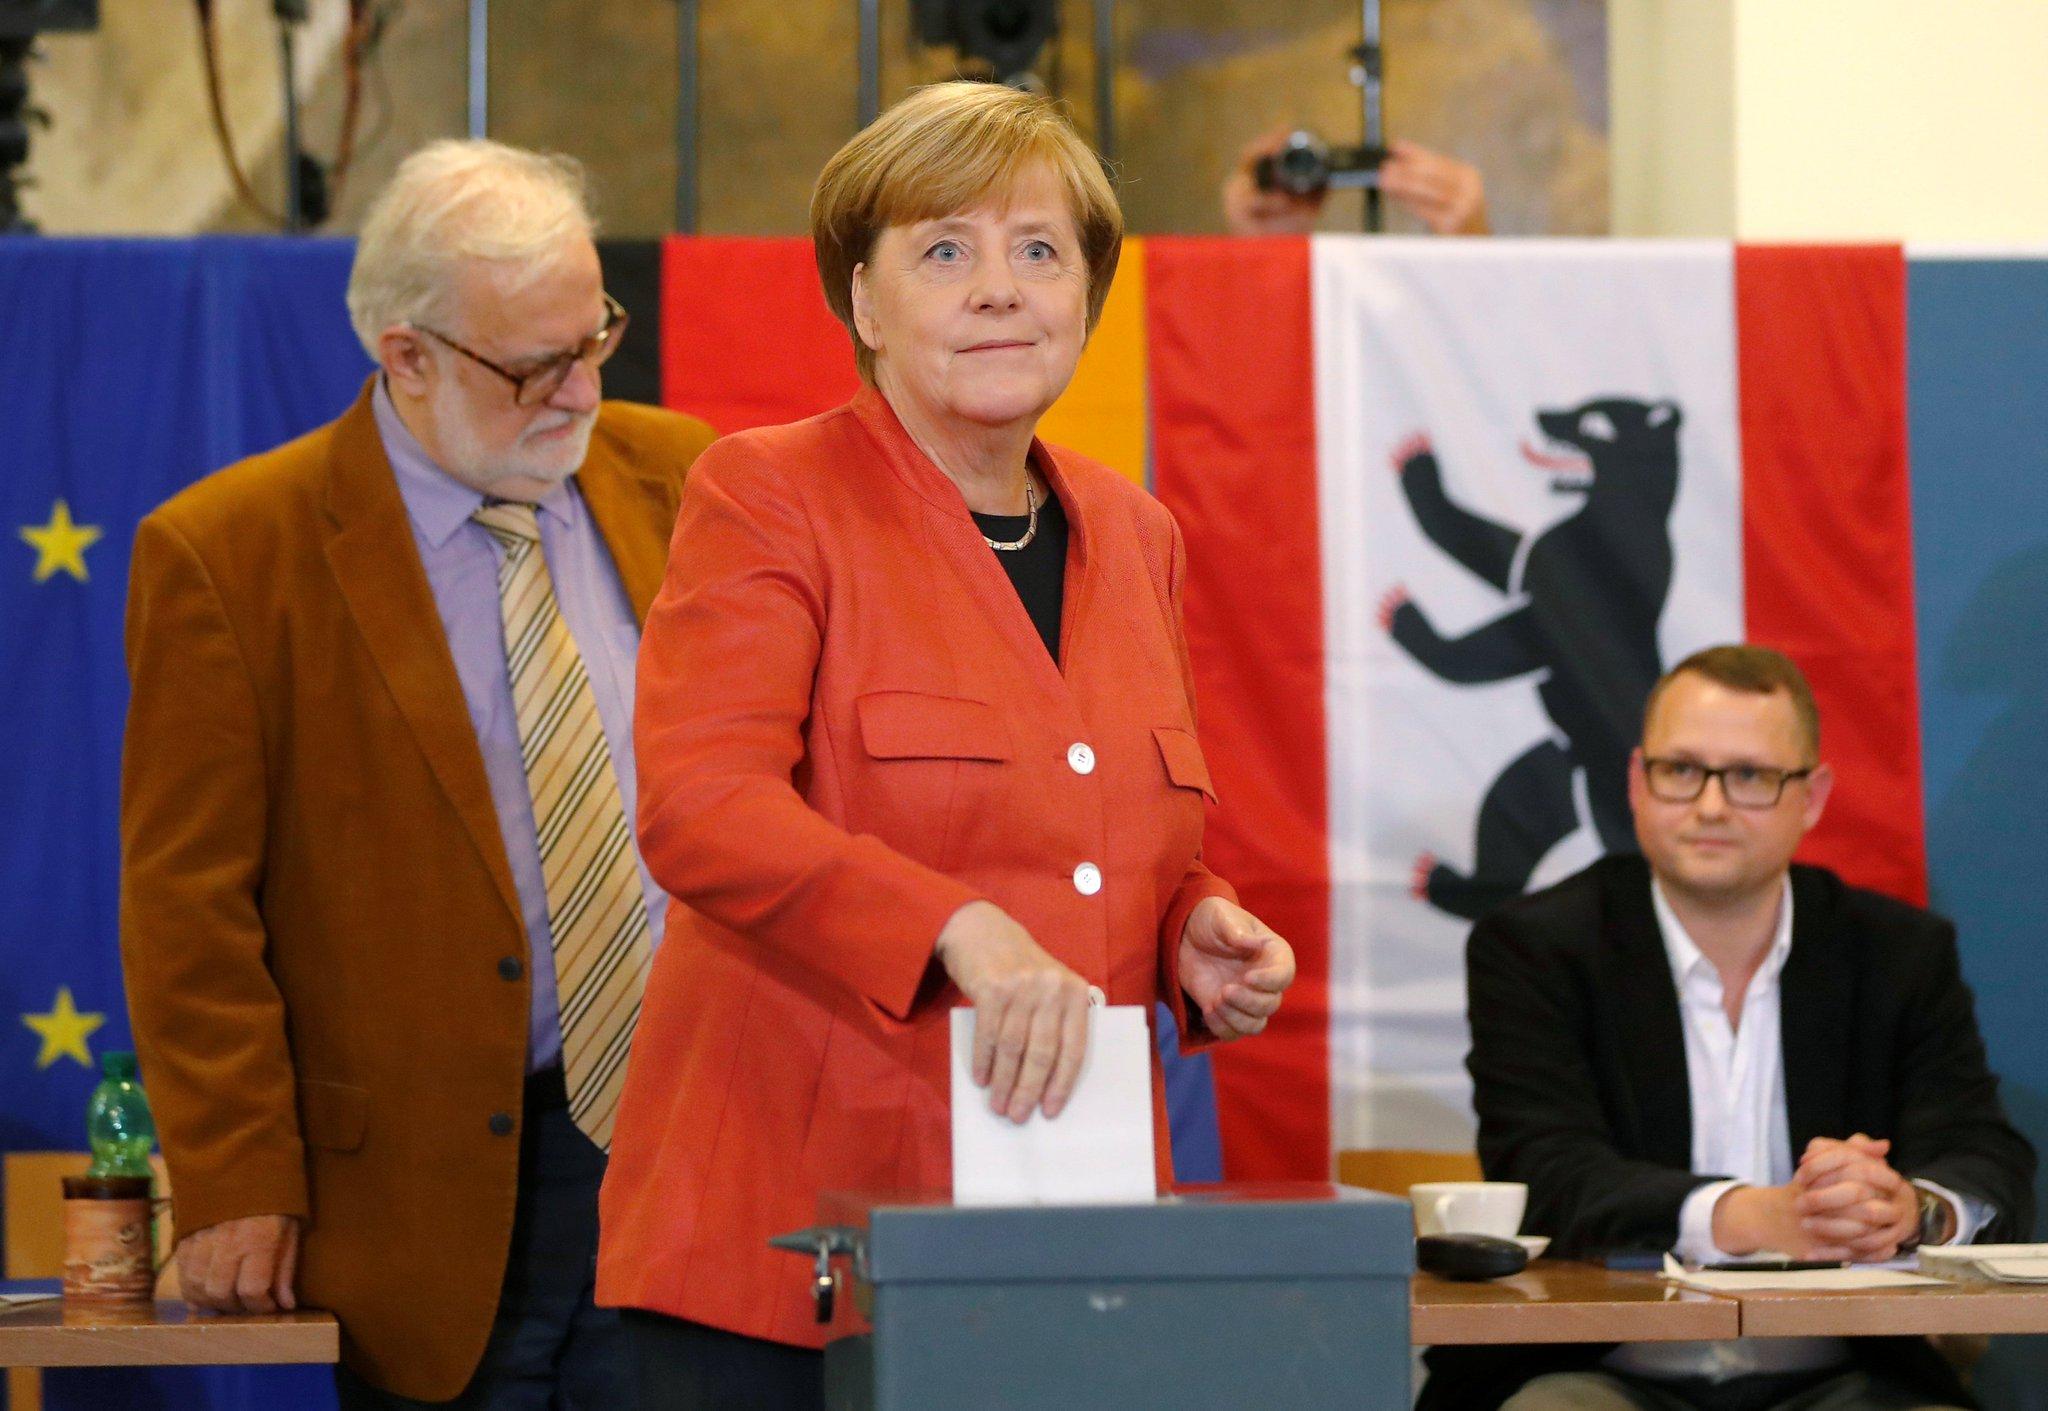 Angela Merkel se perfila para un cuarto periodo como mandataria de Alemania https://t.co/uN4IYNXm1k https://t.co/ufZ0mY26PE